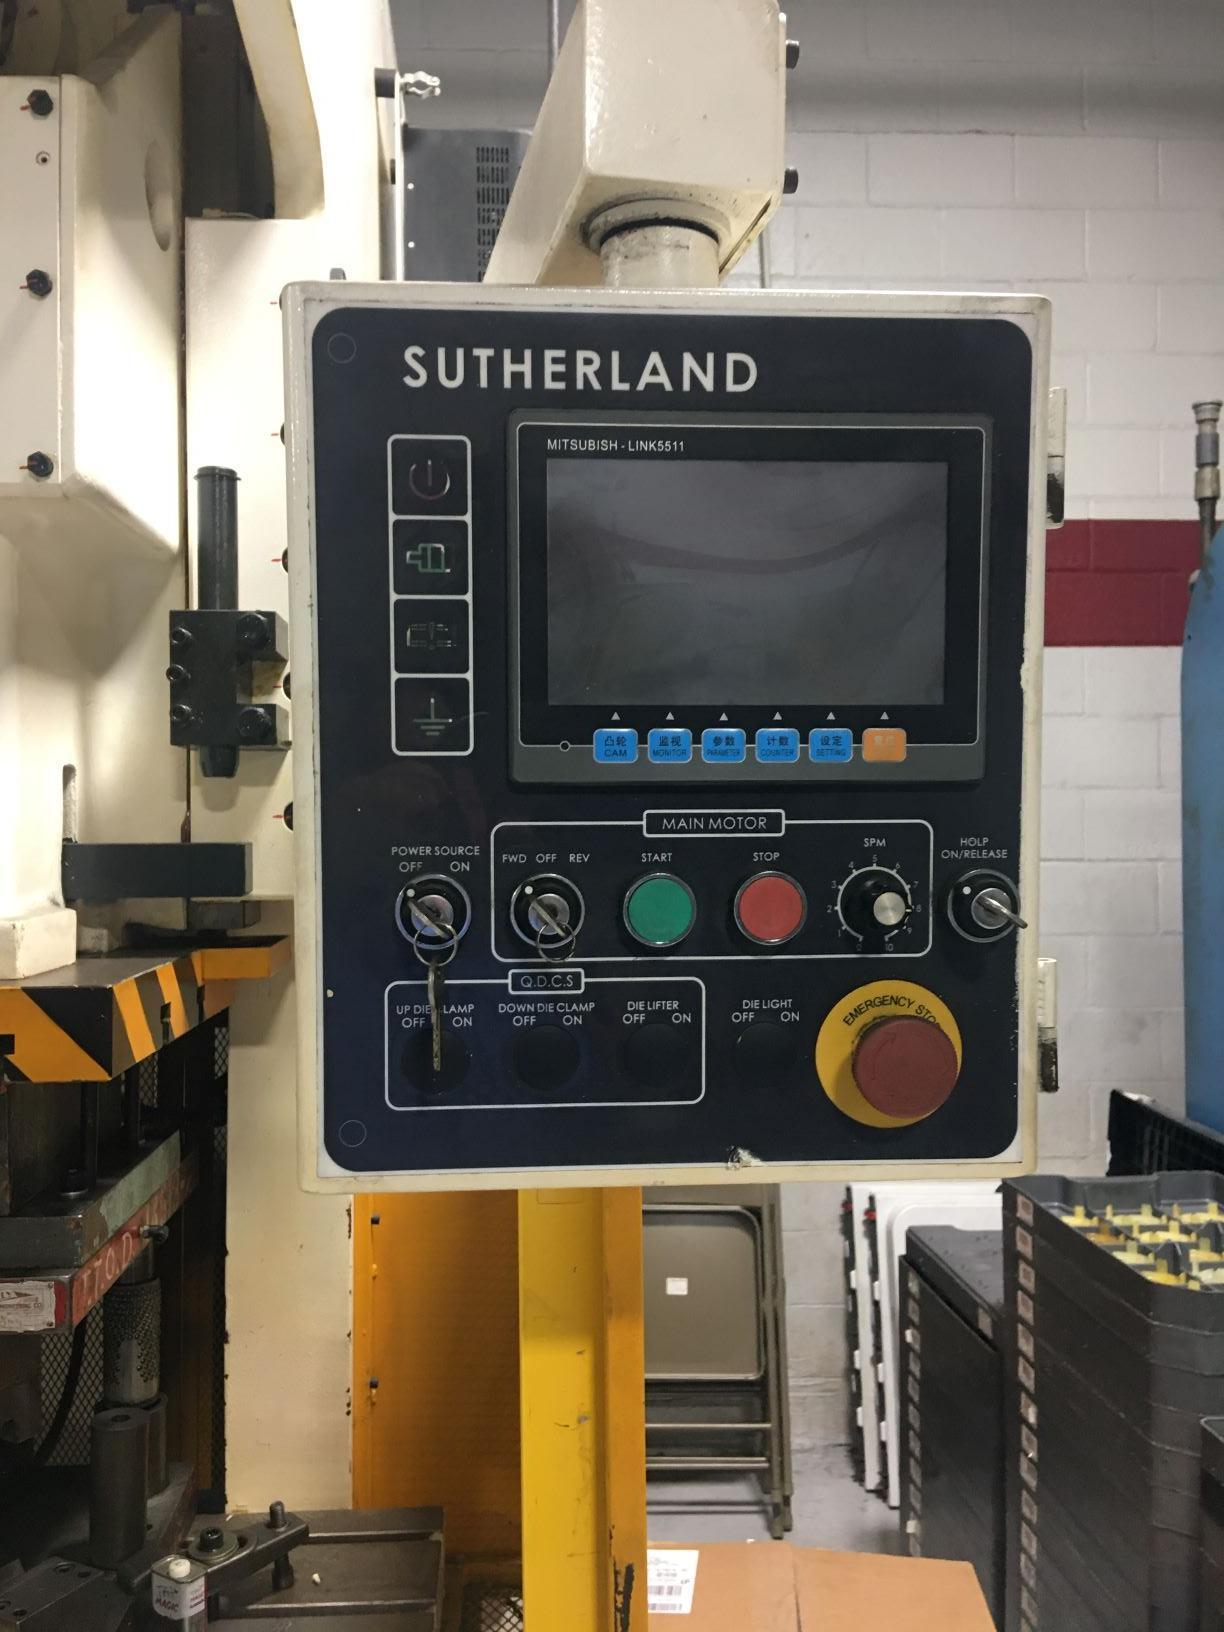 SUTHERLAND2013 Sutherland Mark 121-V Punch Press